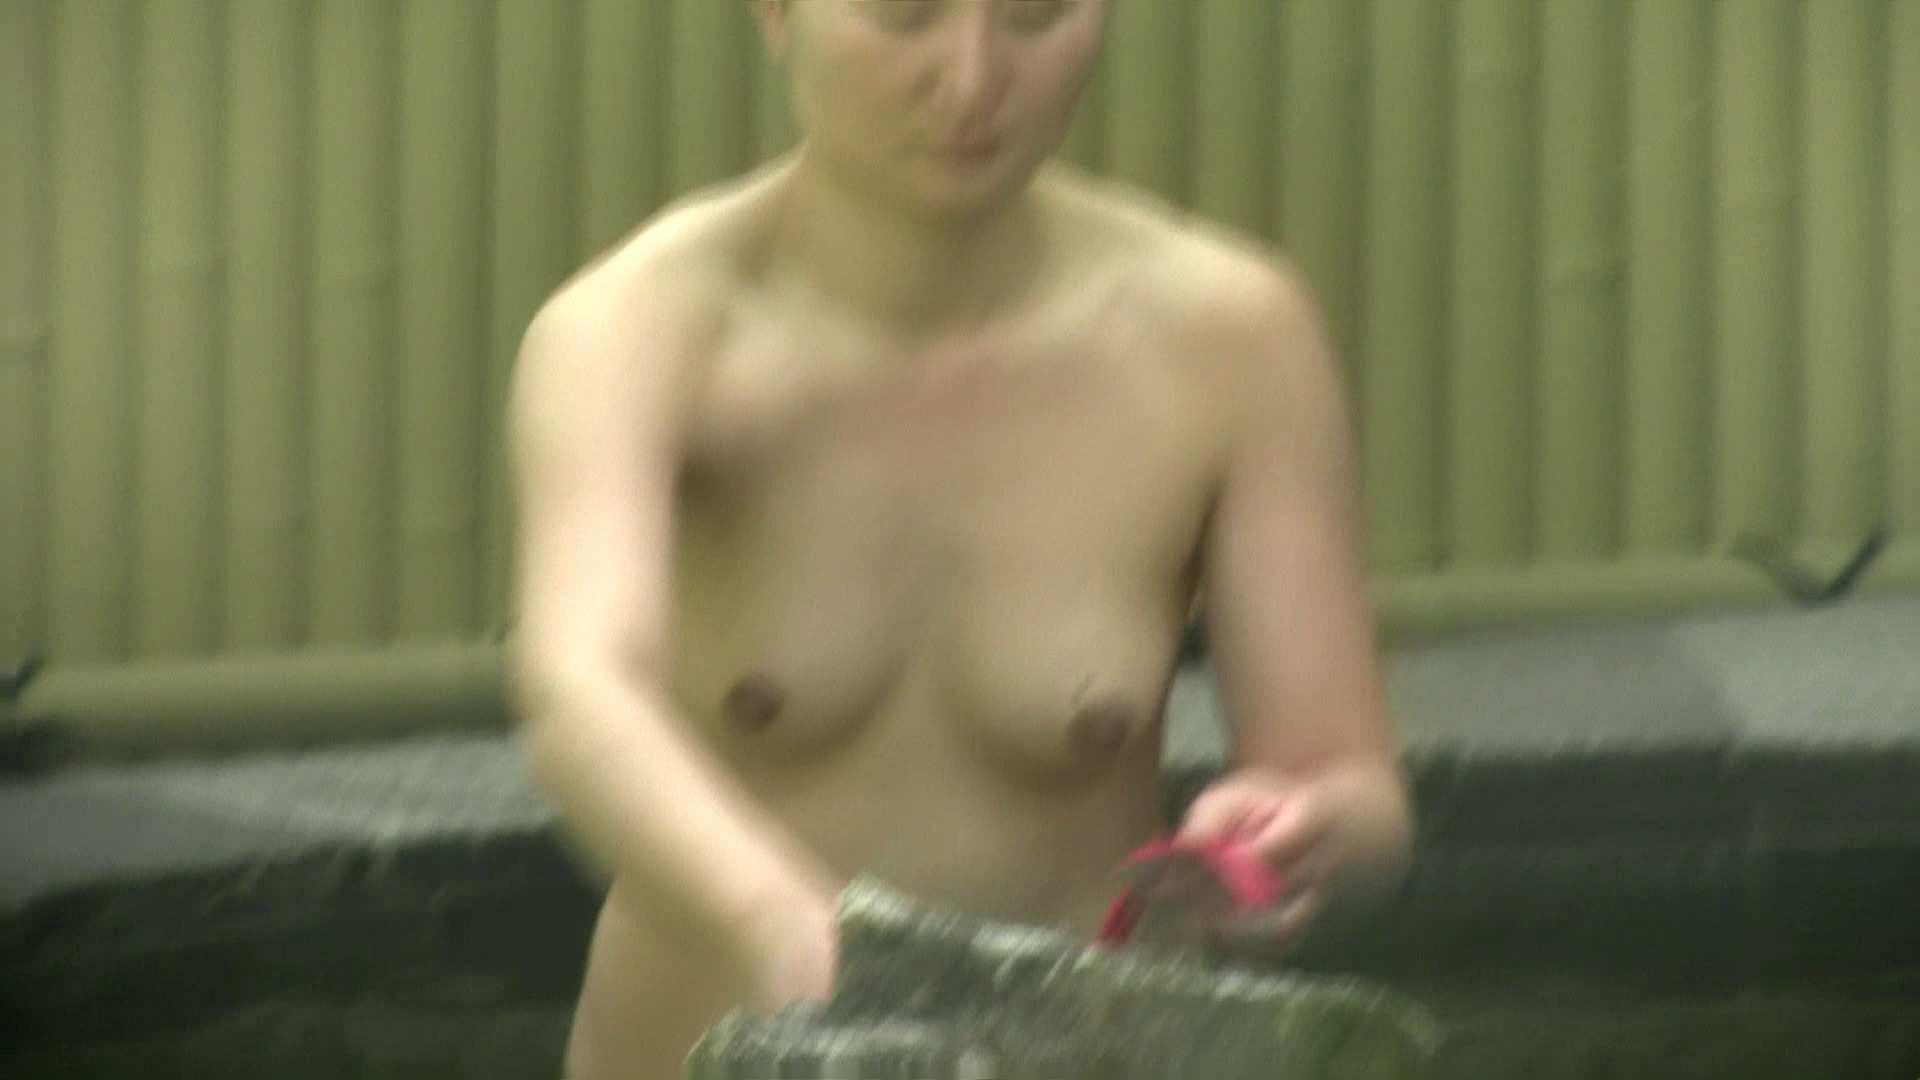 Aquaな露天風呂Vol.632 盗撮 | OLセックス  70画像 1